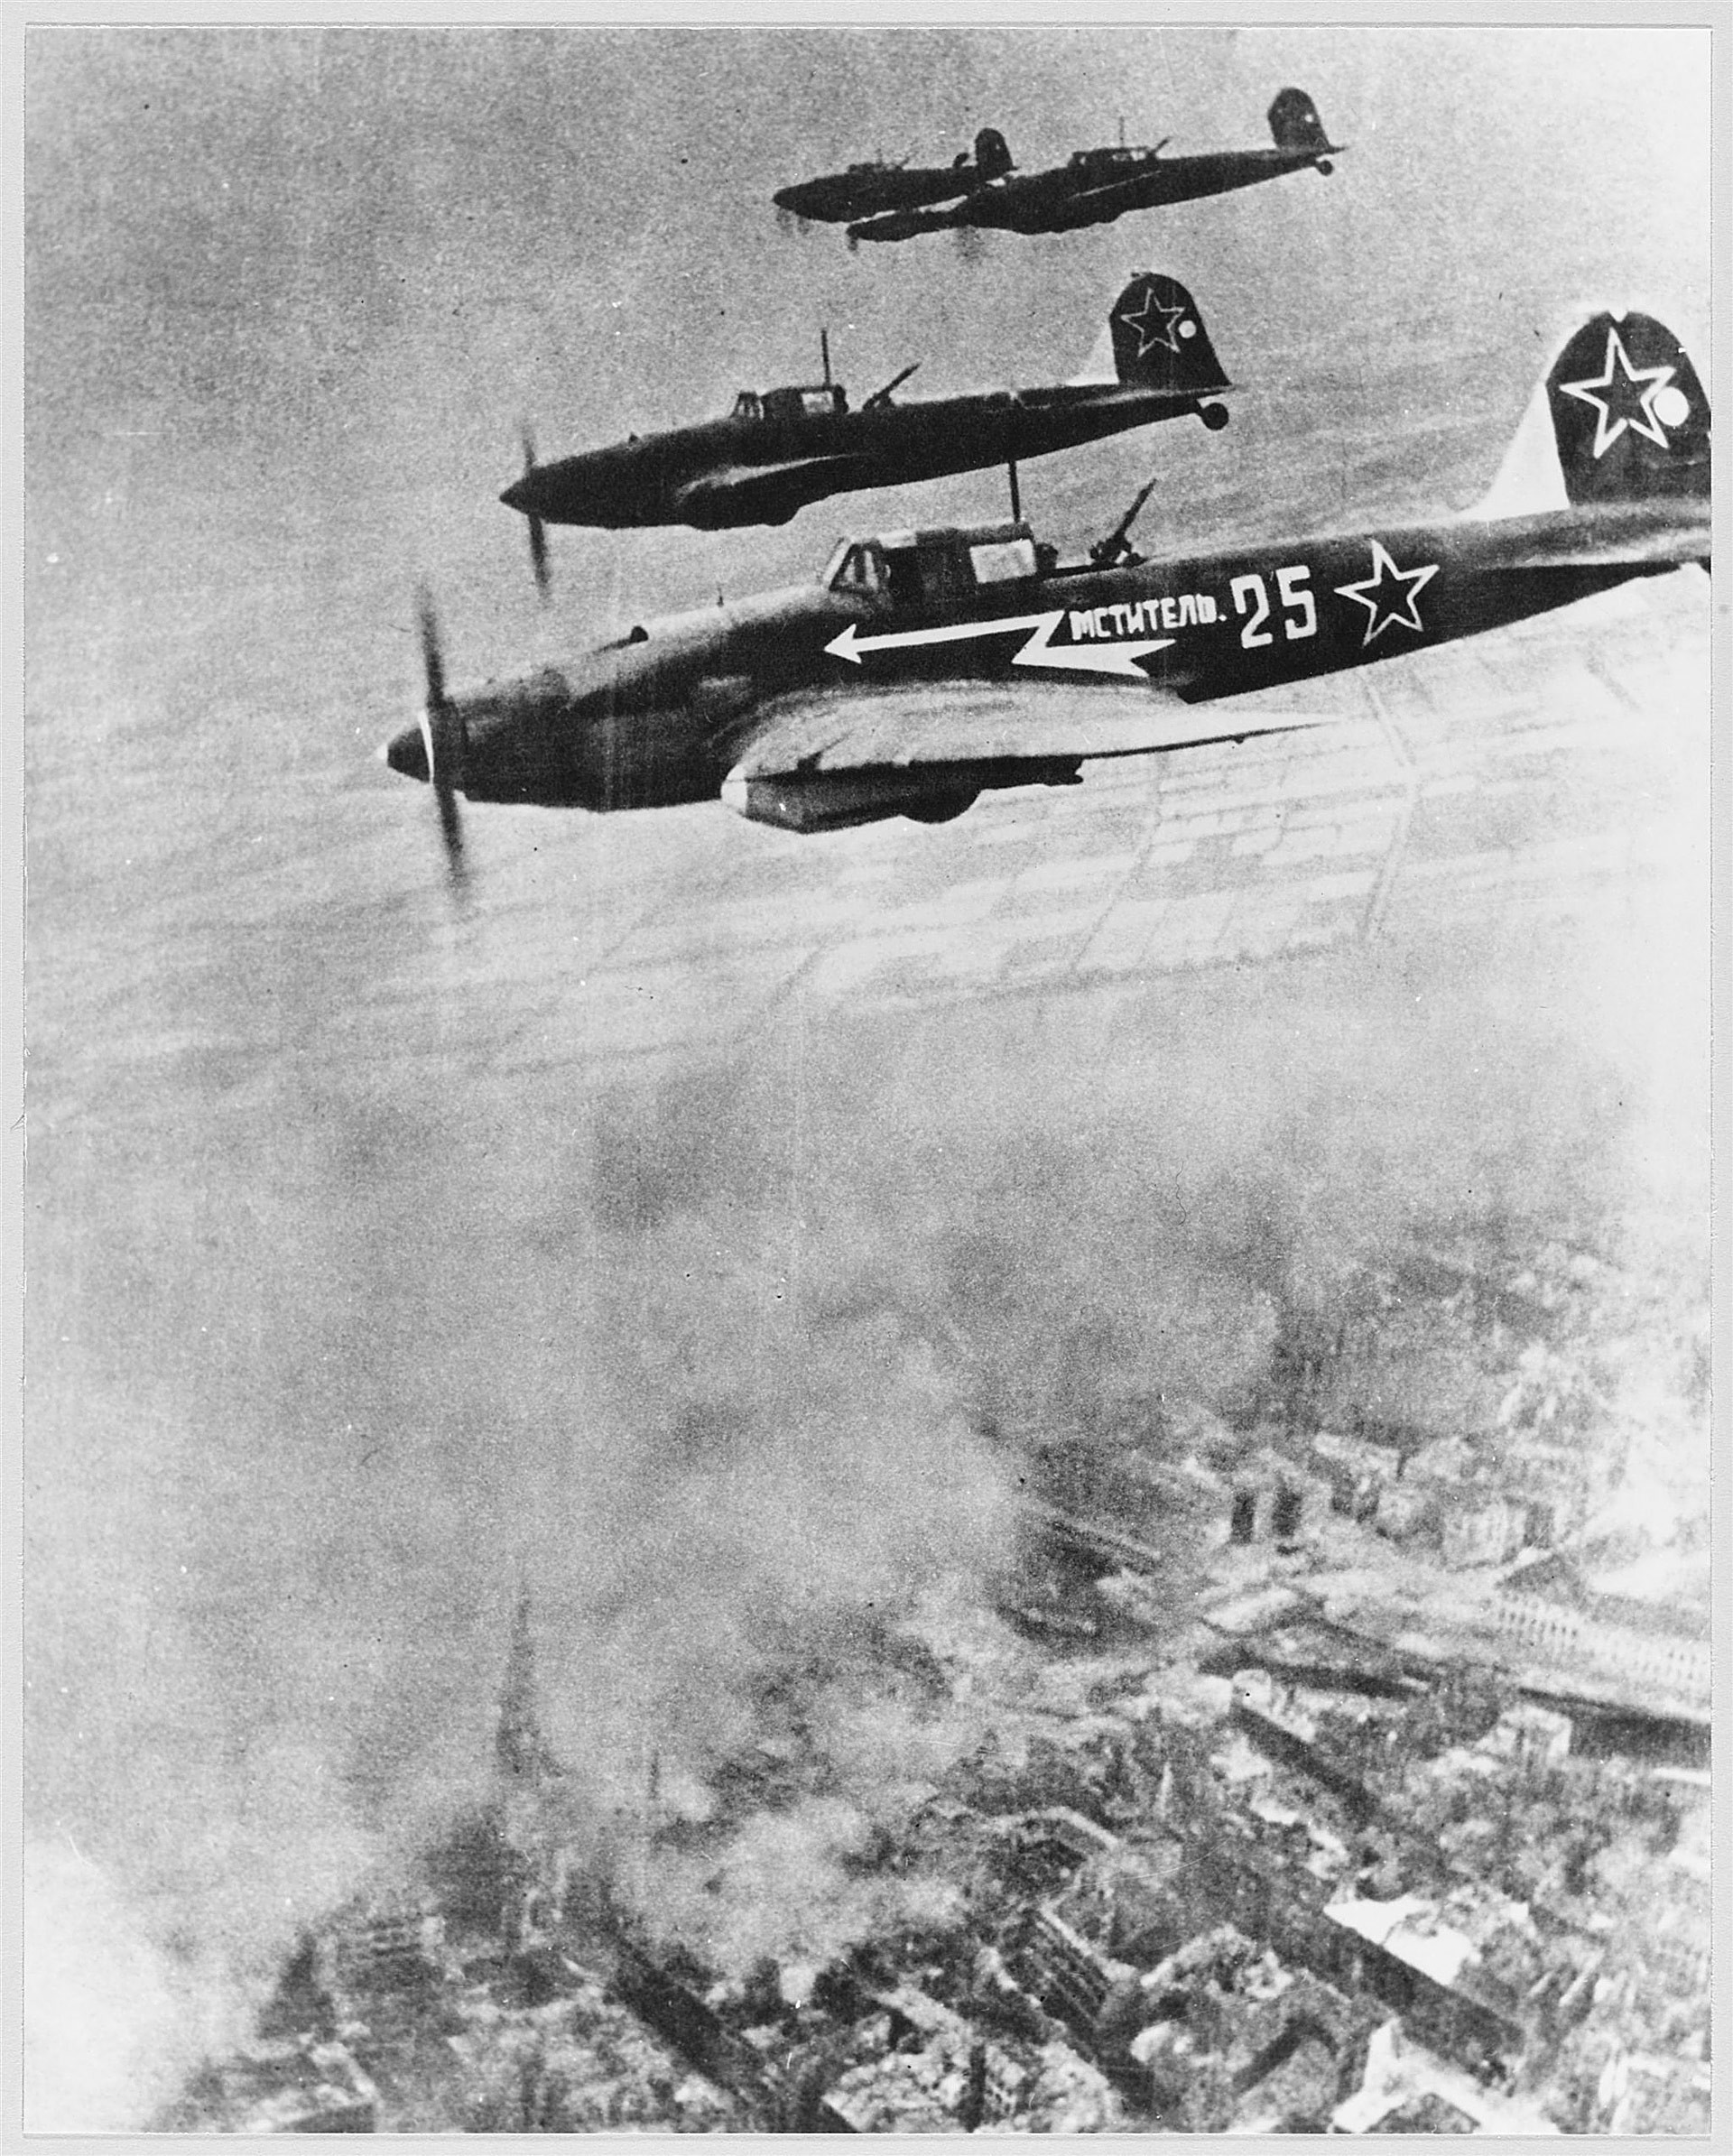 Pesawat Ilyushin Il-2 di langit Berlin, 1945.